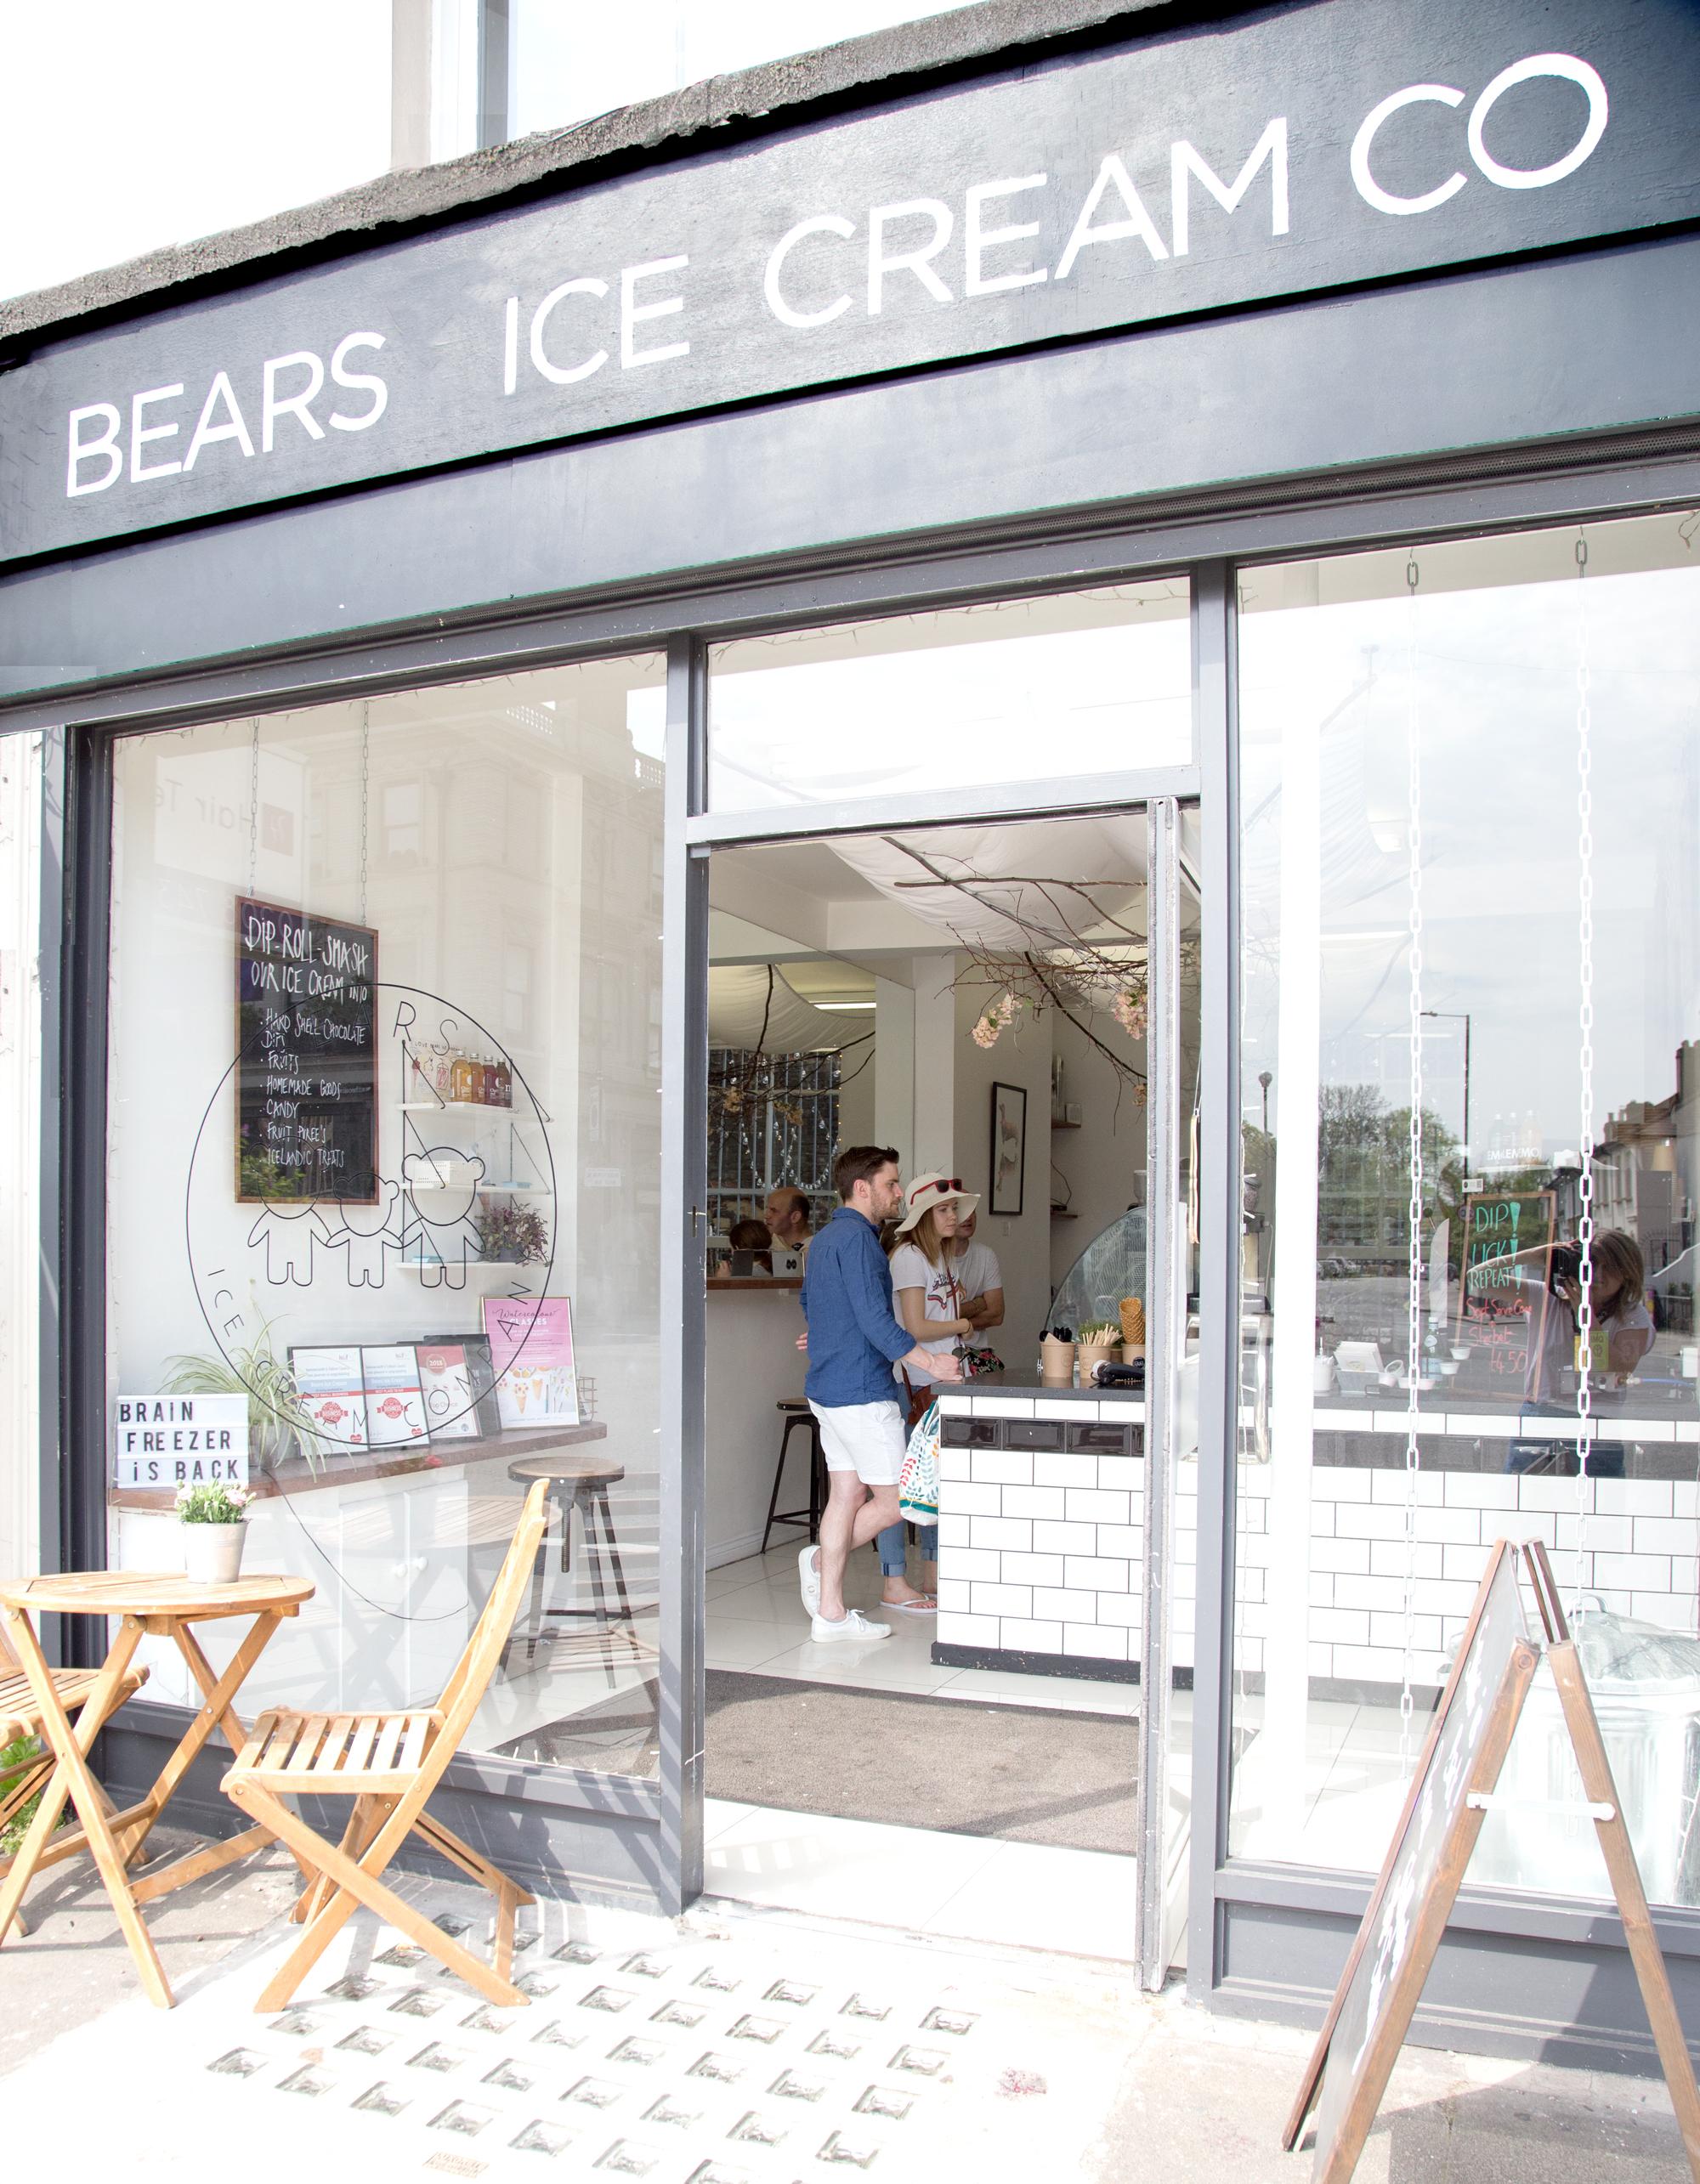 Bears Ice Cream Co, West London